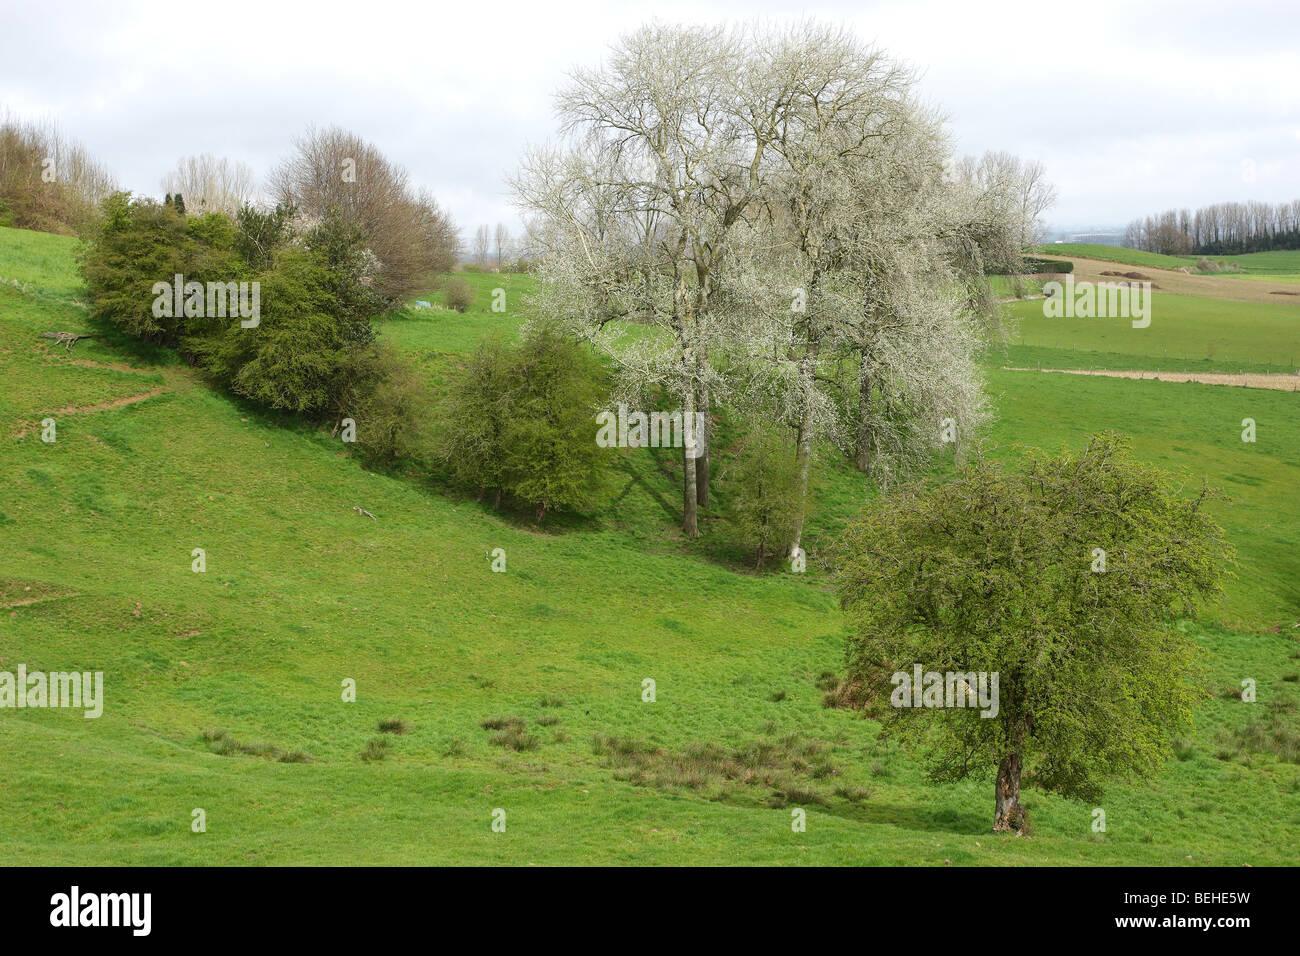 Bocage landscape with hedges and trees, Scherpenberg, Belgium - Stock Image